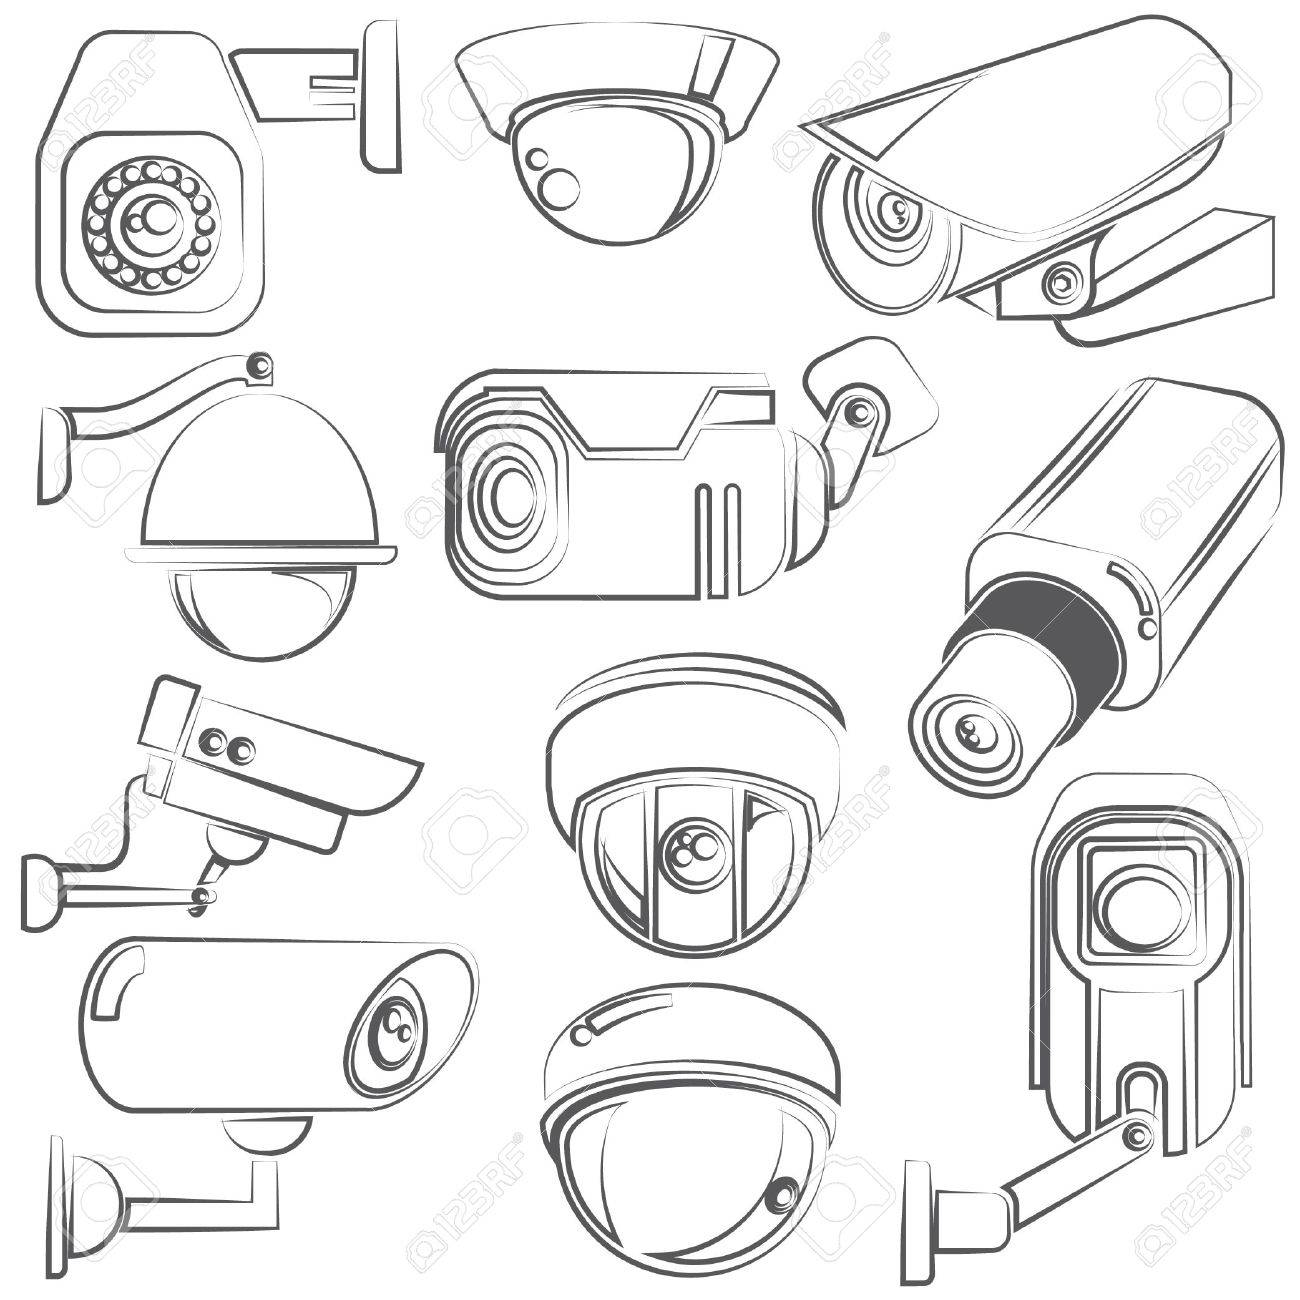 sketch CCTV, video surveillance set - 29185927